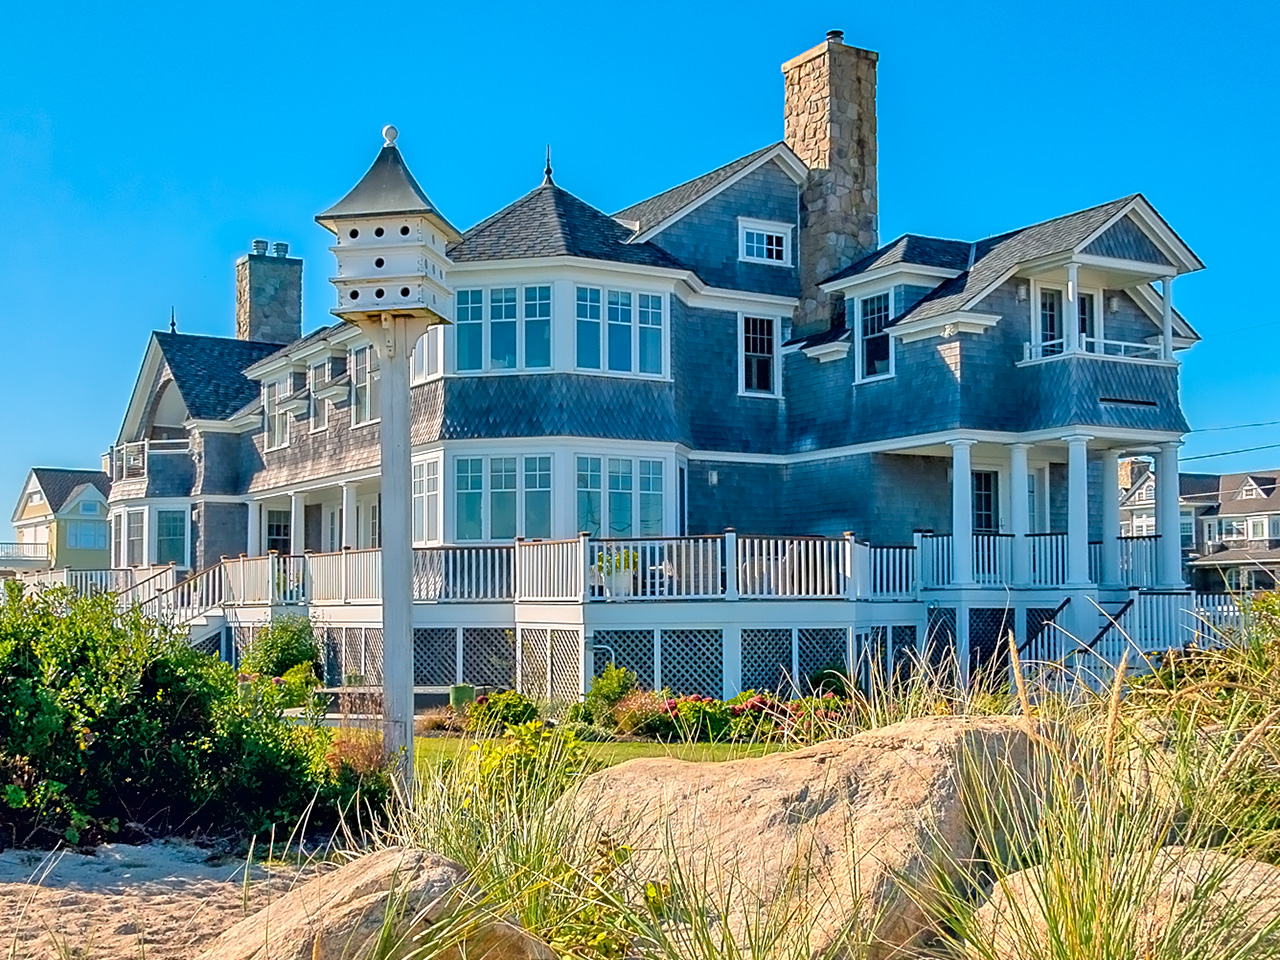 Stephen-Sullivan-Inc-Custom-Home-Builders-Rhode-Island-Green-Hill-Shingles